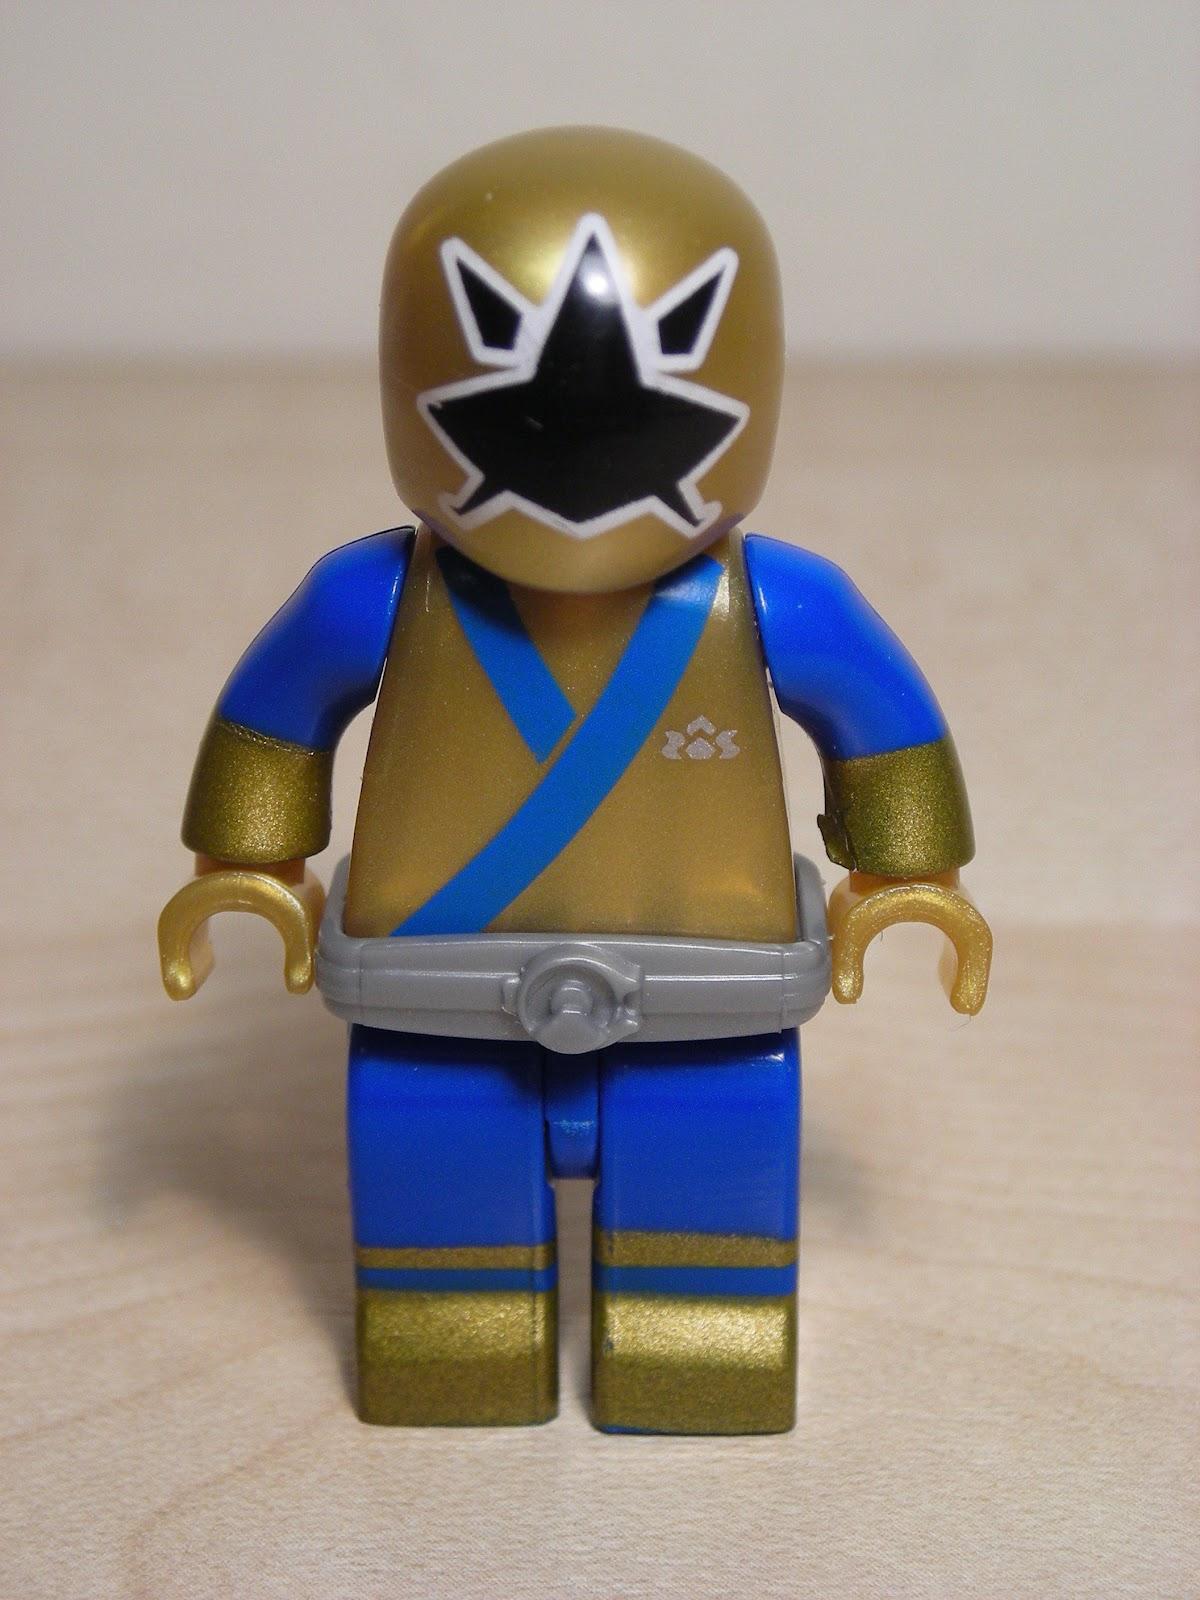 My Shiny Toy Robots: Mega Bloks Power Rangers Samurai ... Power Rangers Samurai Gold Ranger Barracuda Blade Toy